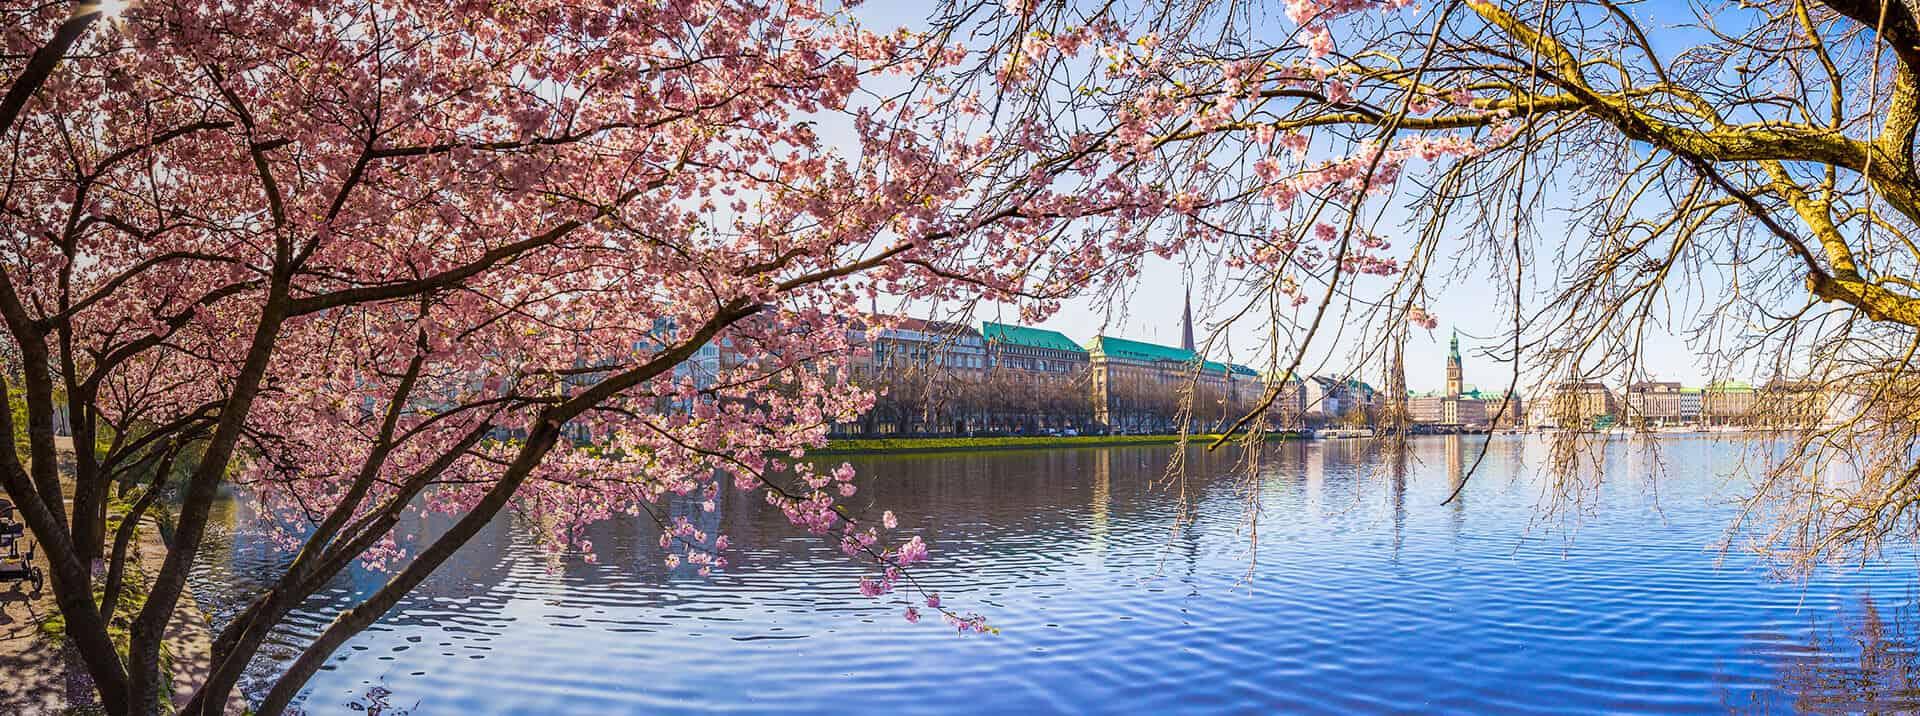 Featured-Image_Boarding_Hamburg3_1920x716